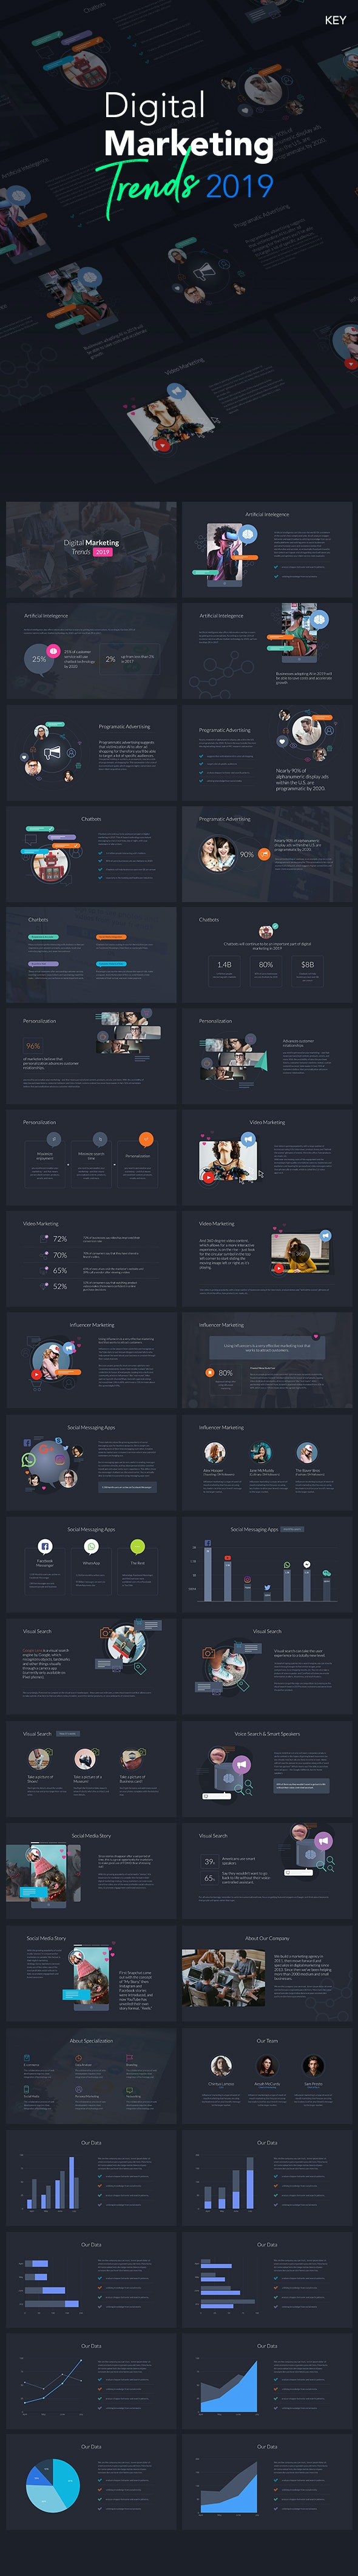 Digital Marketing 2019 - Keynote Template - Keynote Templates Presentation Templates